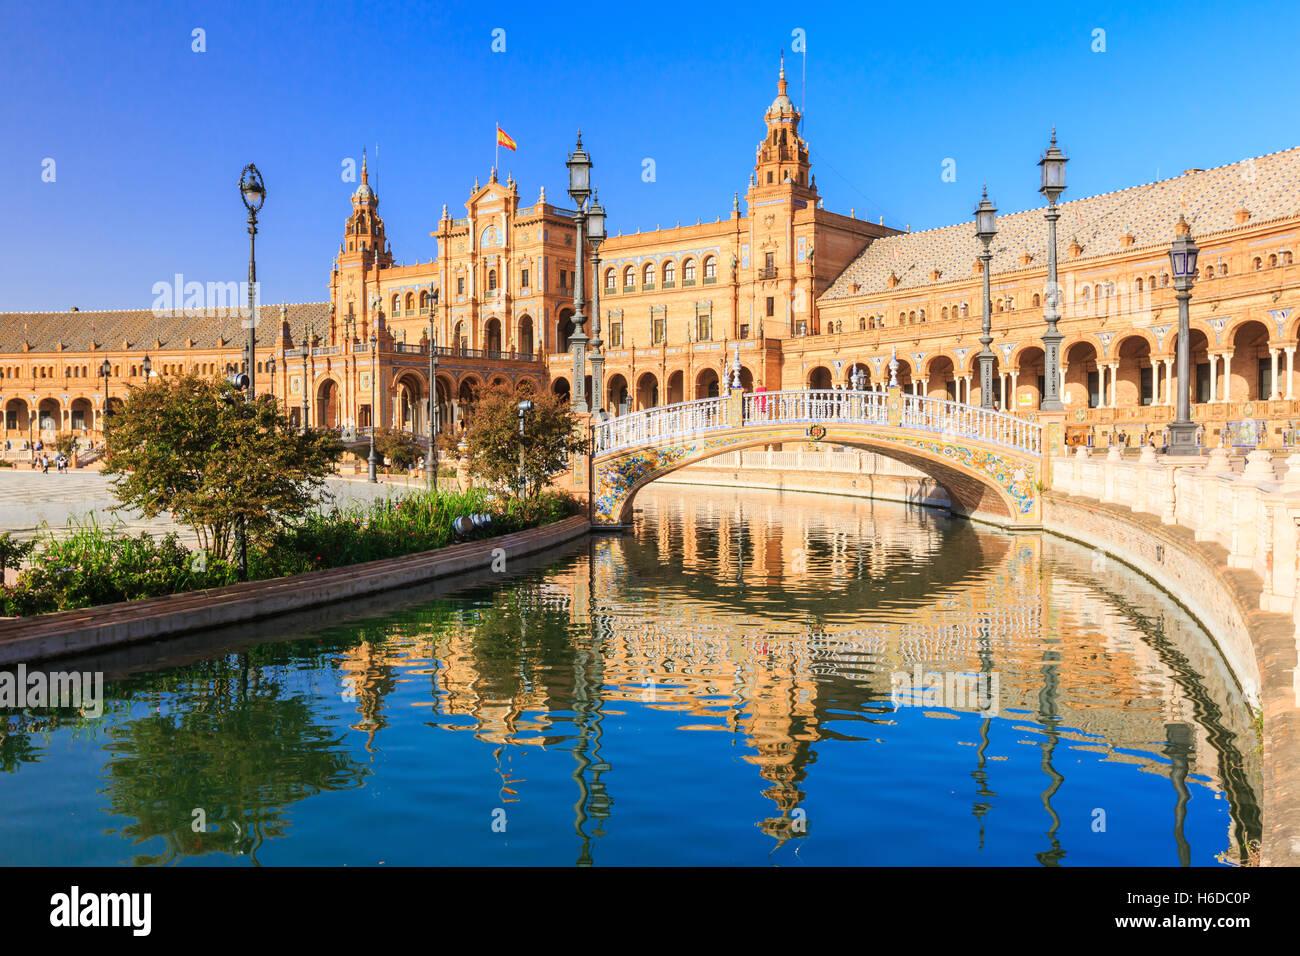 Seville, Spain. Spanish Square (Plaza de Espana) - Stock Image